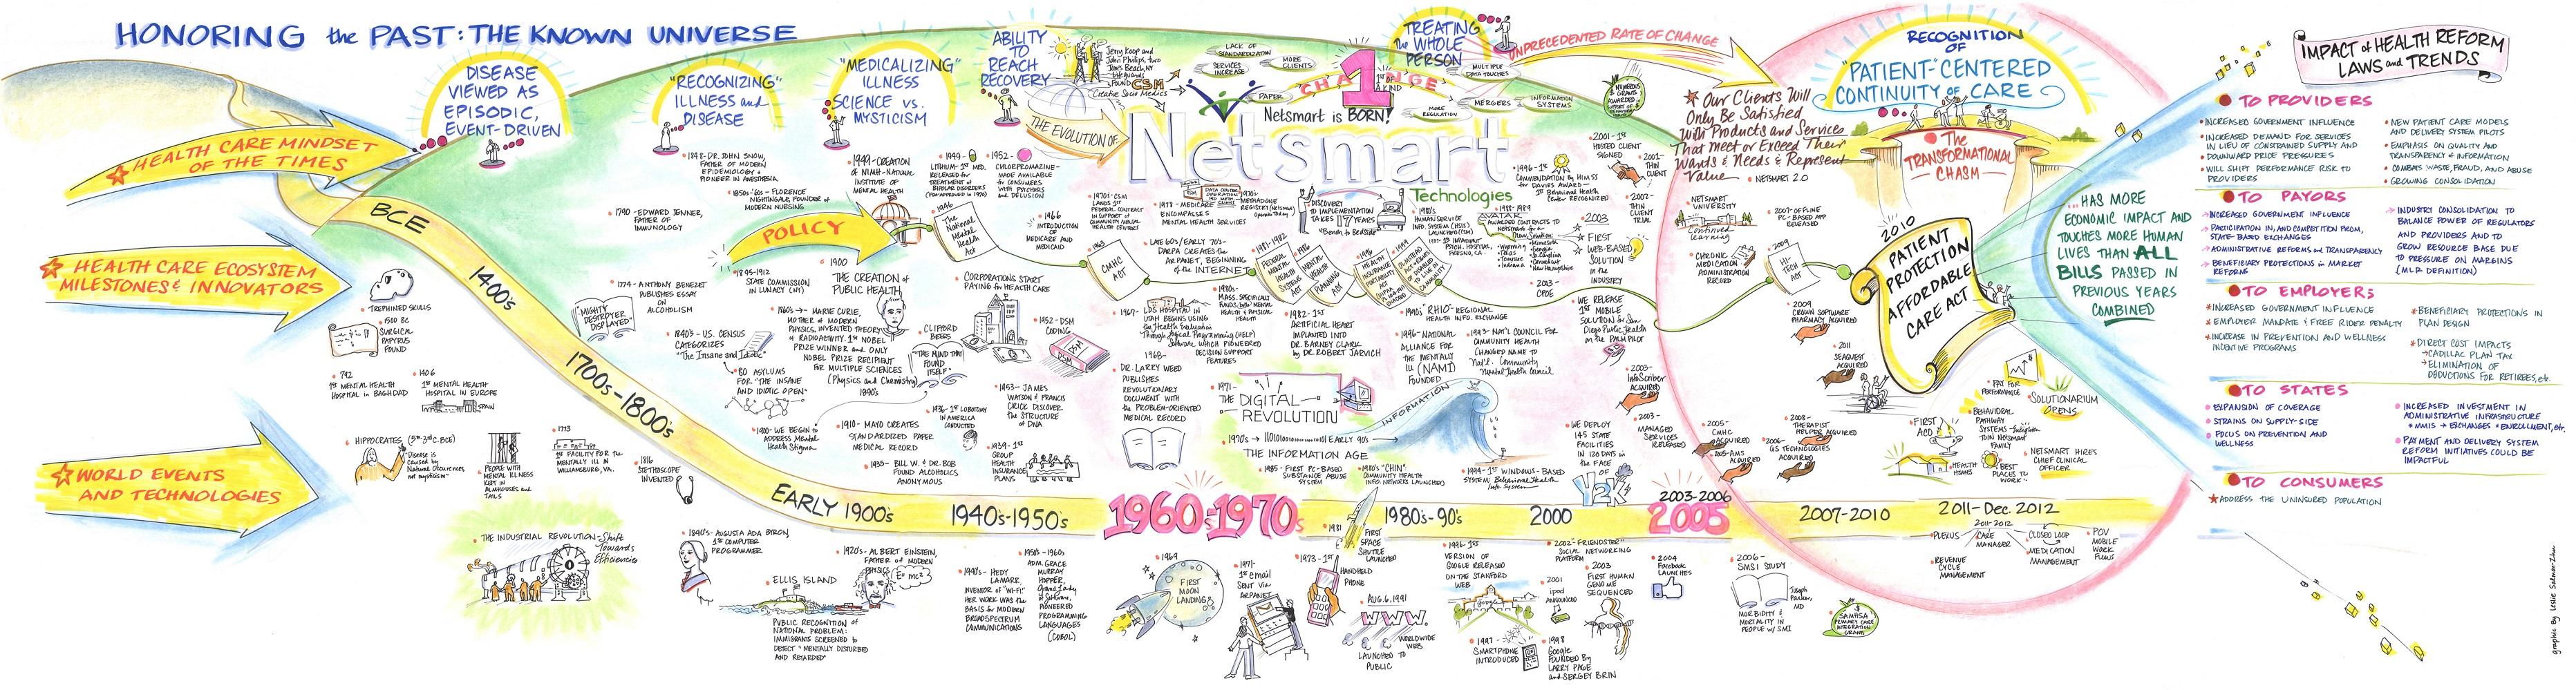 history of community health pdf